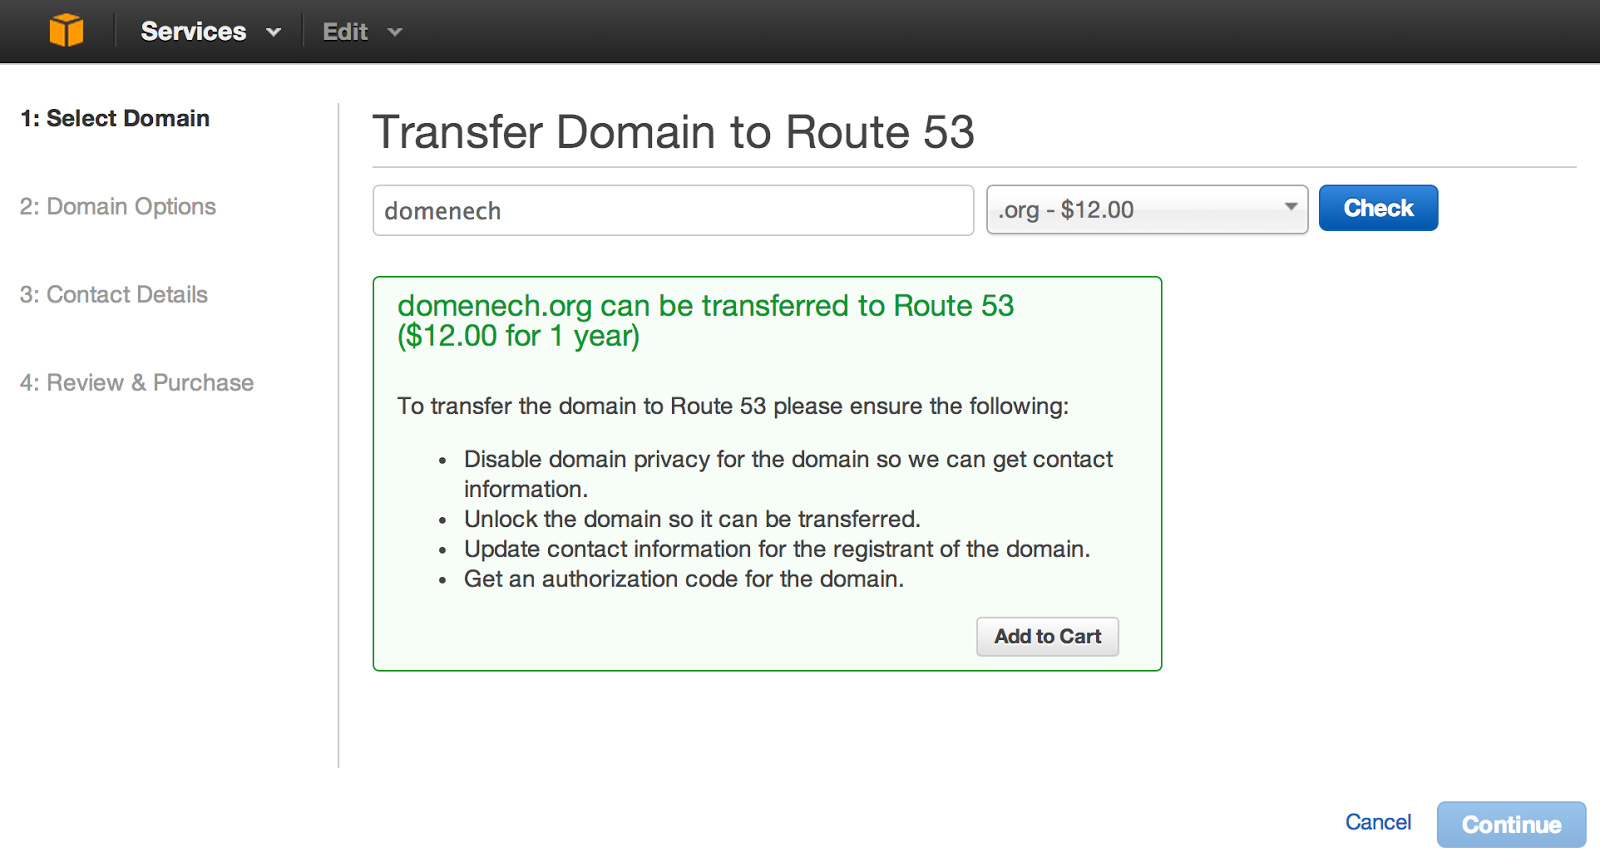 blog-domenech-org-transfer-internet-domain-to-aws-route-53-step-3